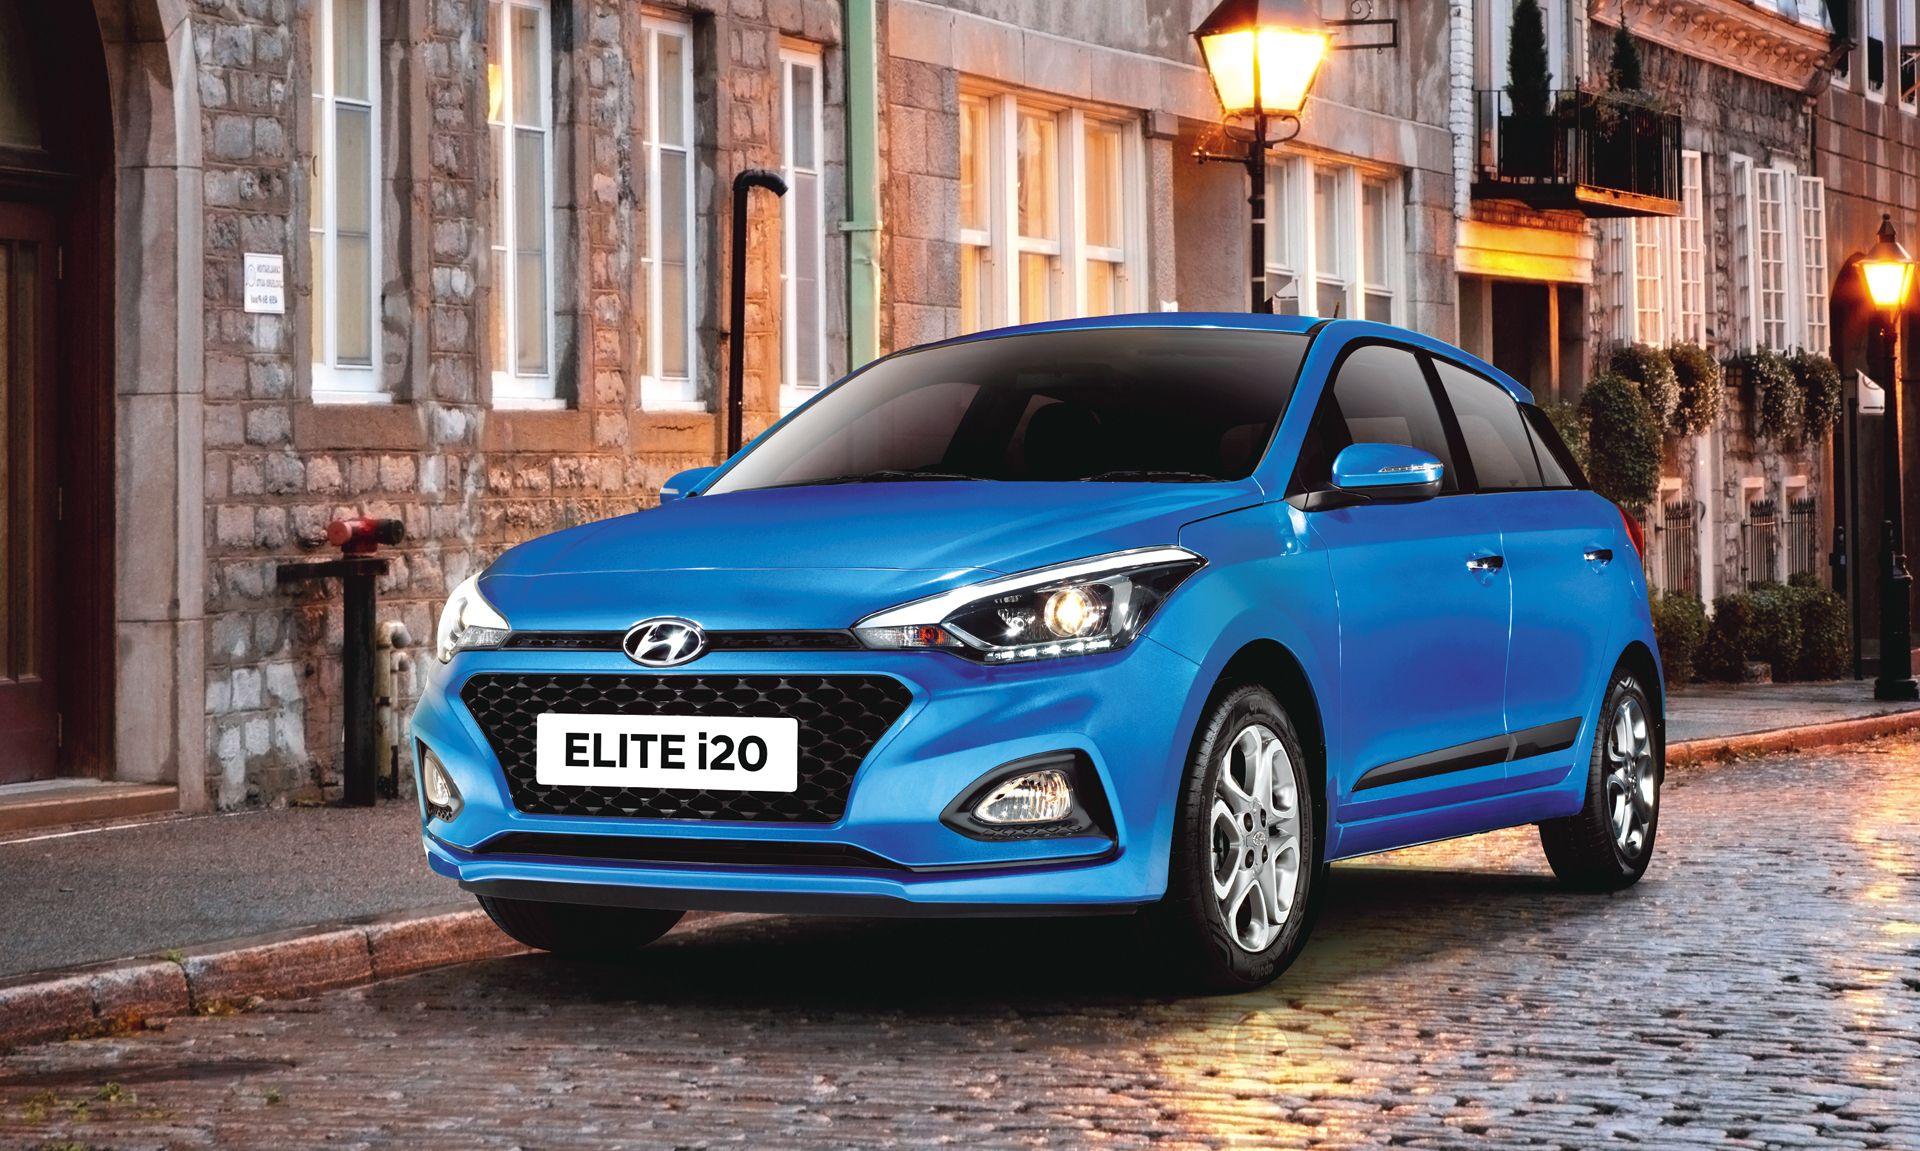 Advaith Hyundai Elite I20 The New 2018 Elite I20 Follows An Evolved Premium Look Sporty Styling And A Robust Rear Stance Ba Hyundai Hyundai Cars Hyundai Motor